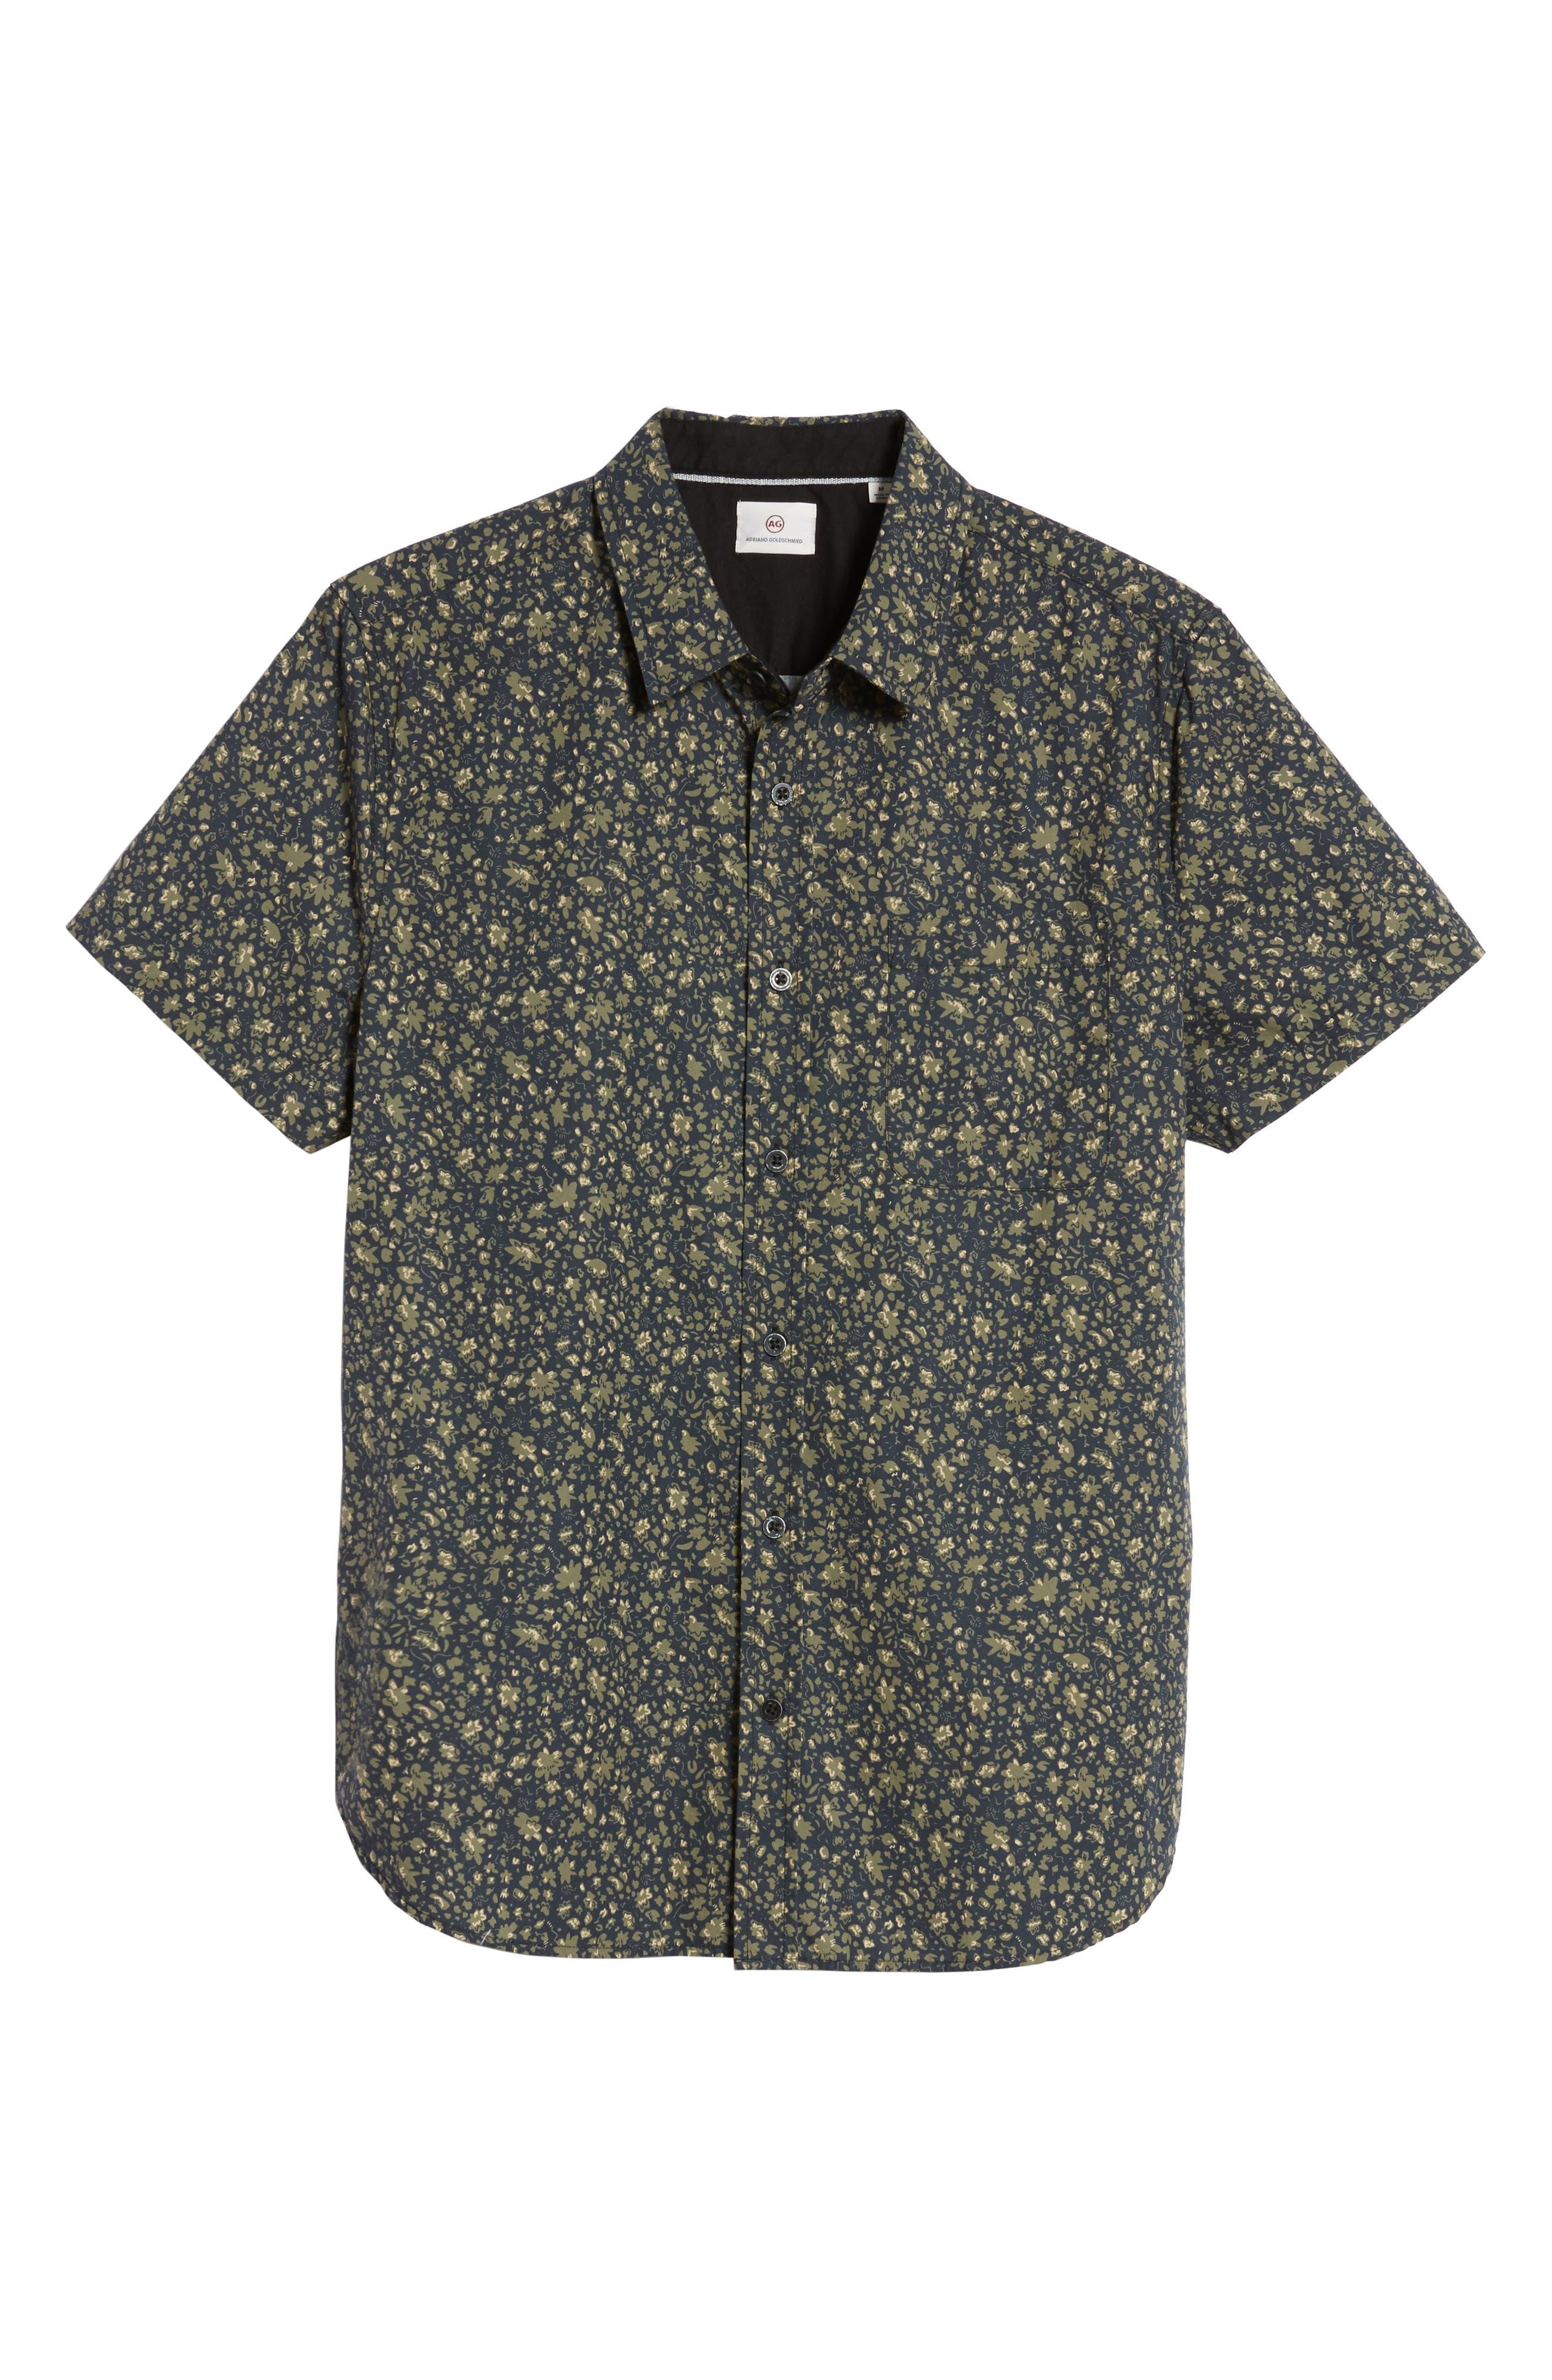 Nash Slim Fit Print Sport Shirt,                             Alternate thumbnail 6, color,                             Floral Camo Black/ Ivy